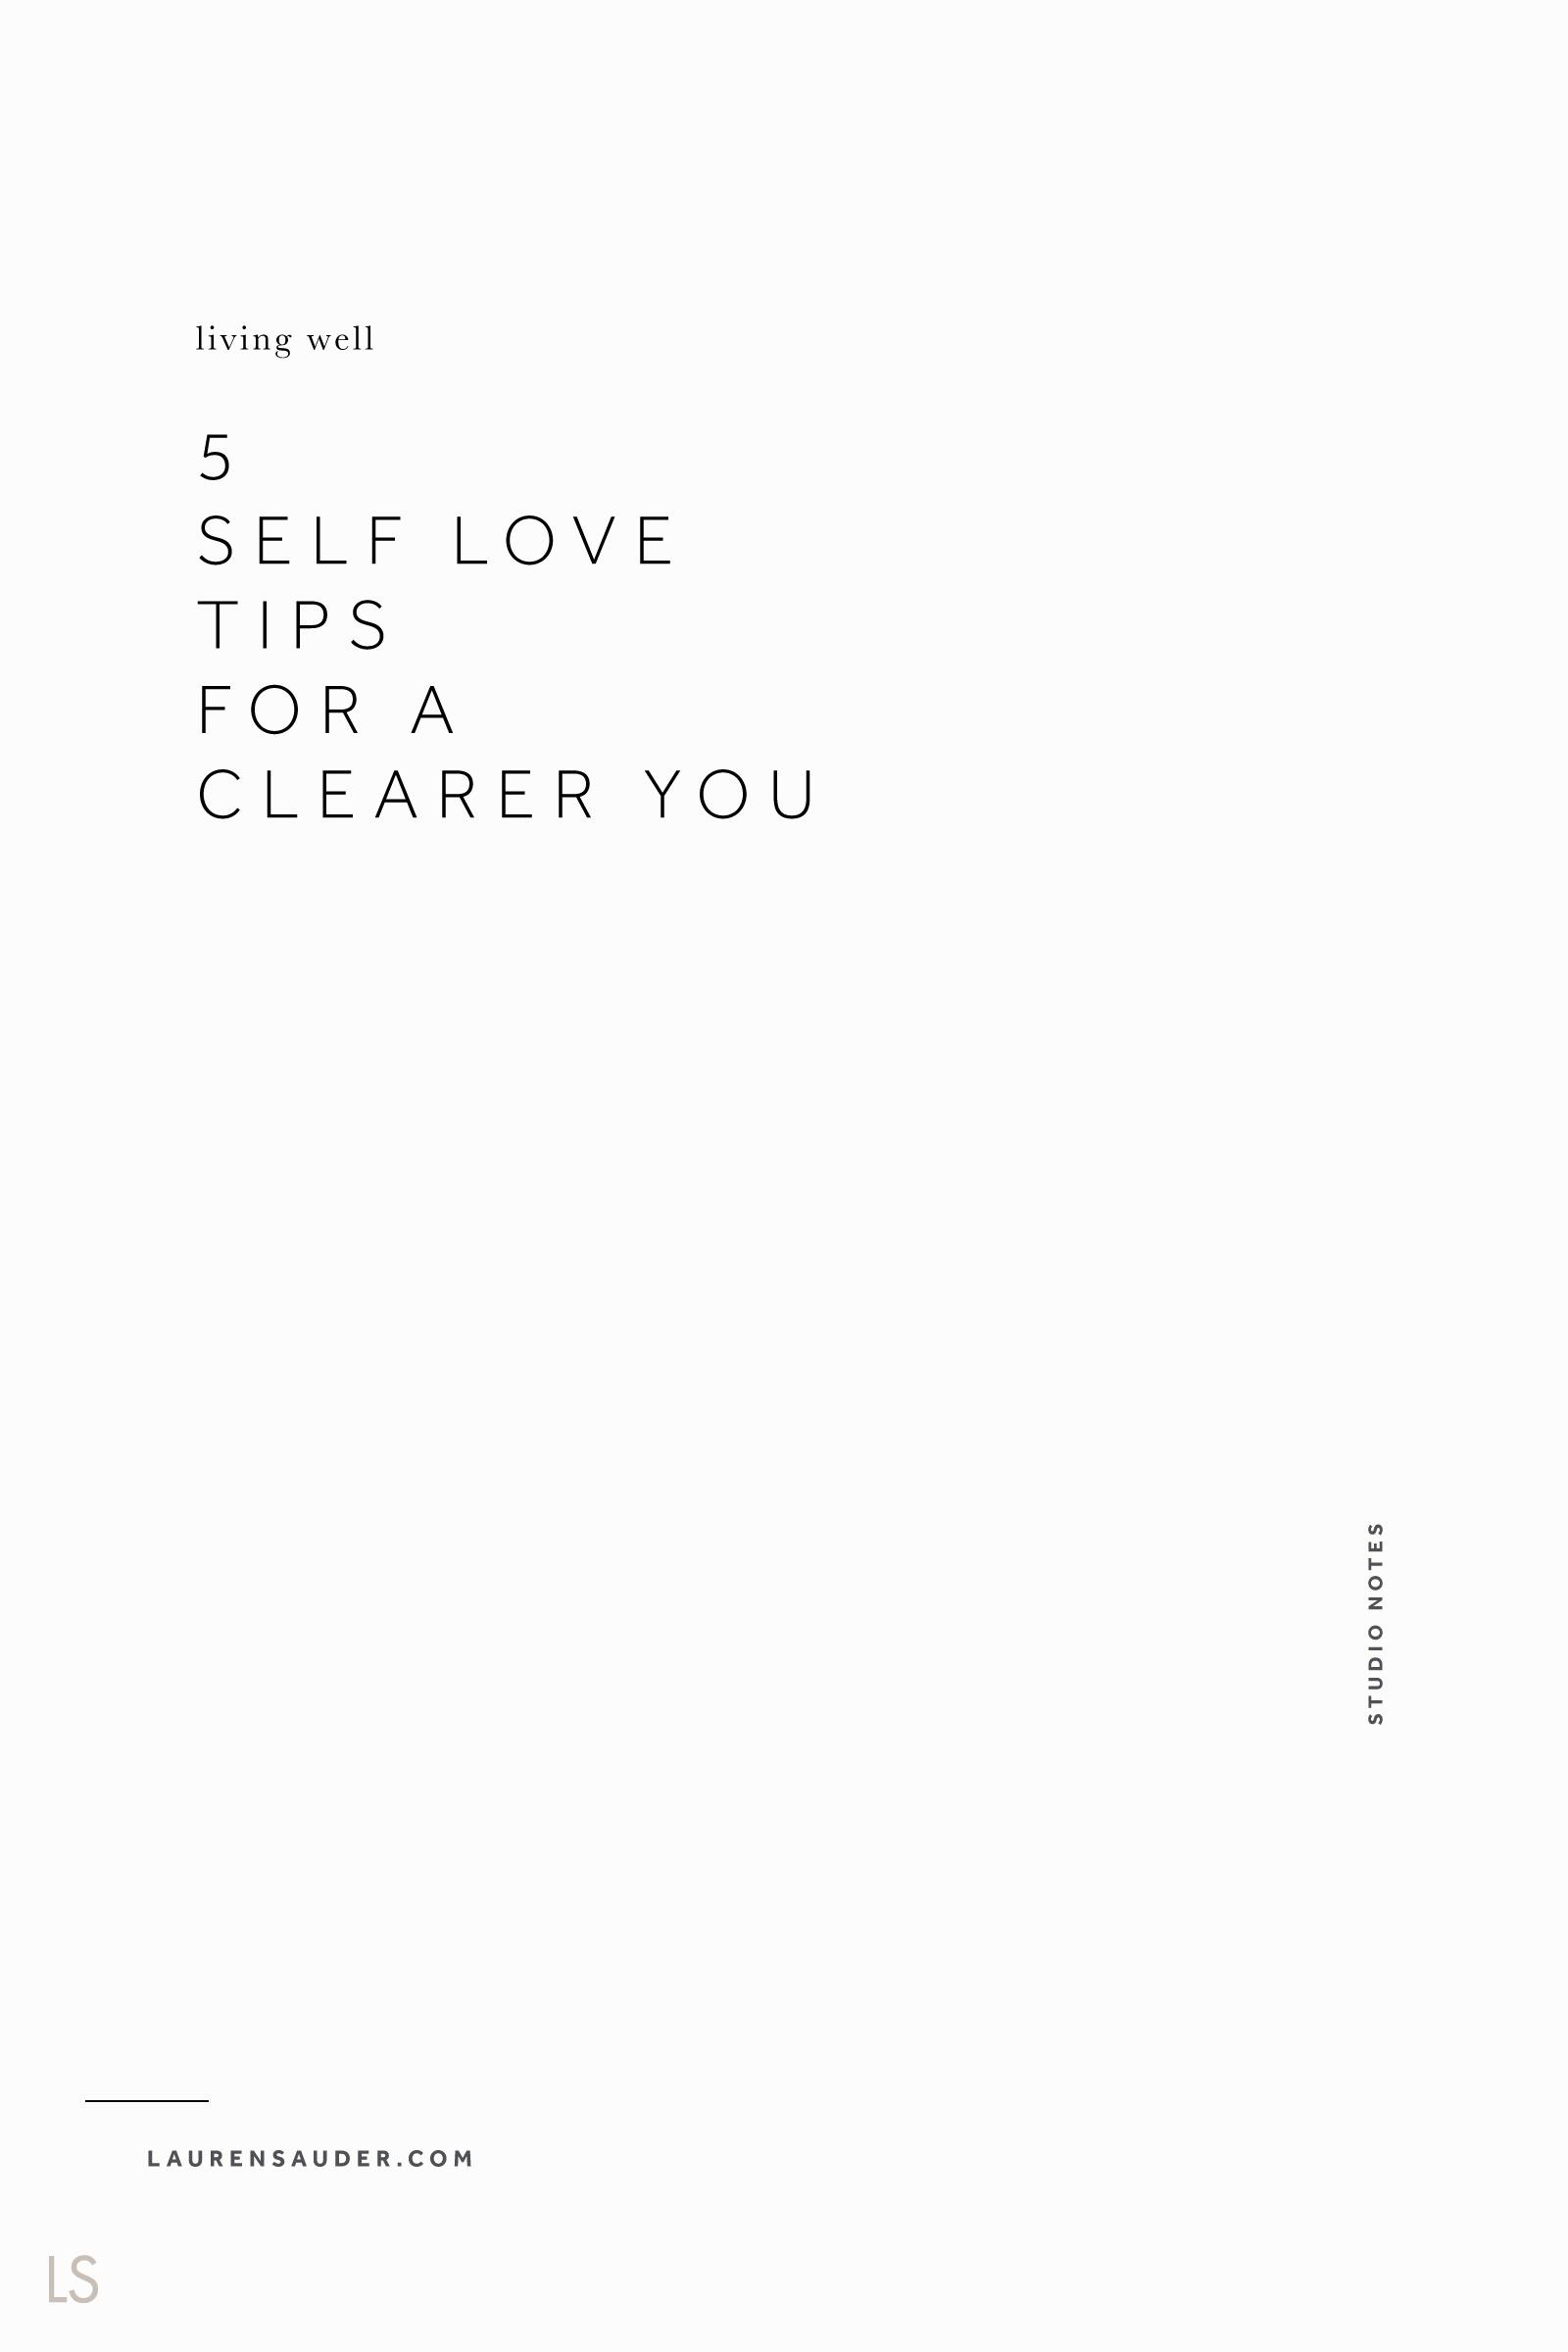 5 Self Love Tips for a Clearer You - Lauren Sauder #selflove self love, self love tips, self love techniques, self love quotes, self love confidence, self love meditation, self love affirmations